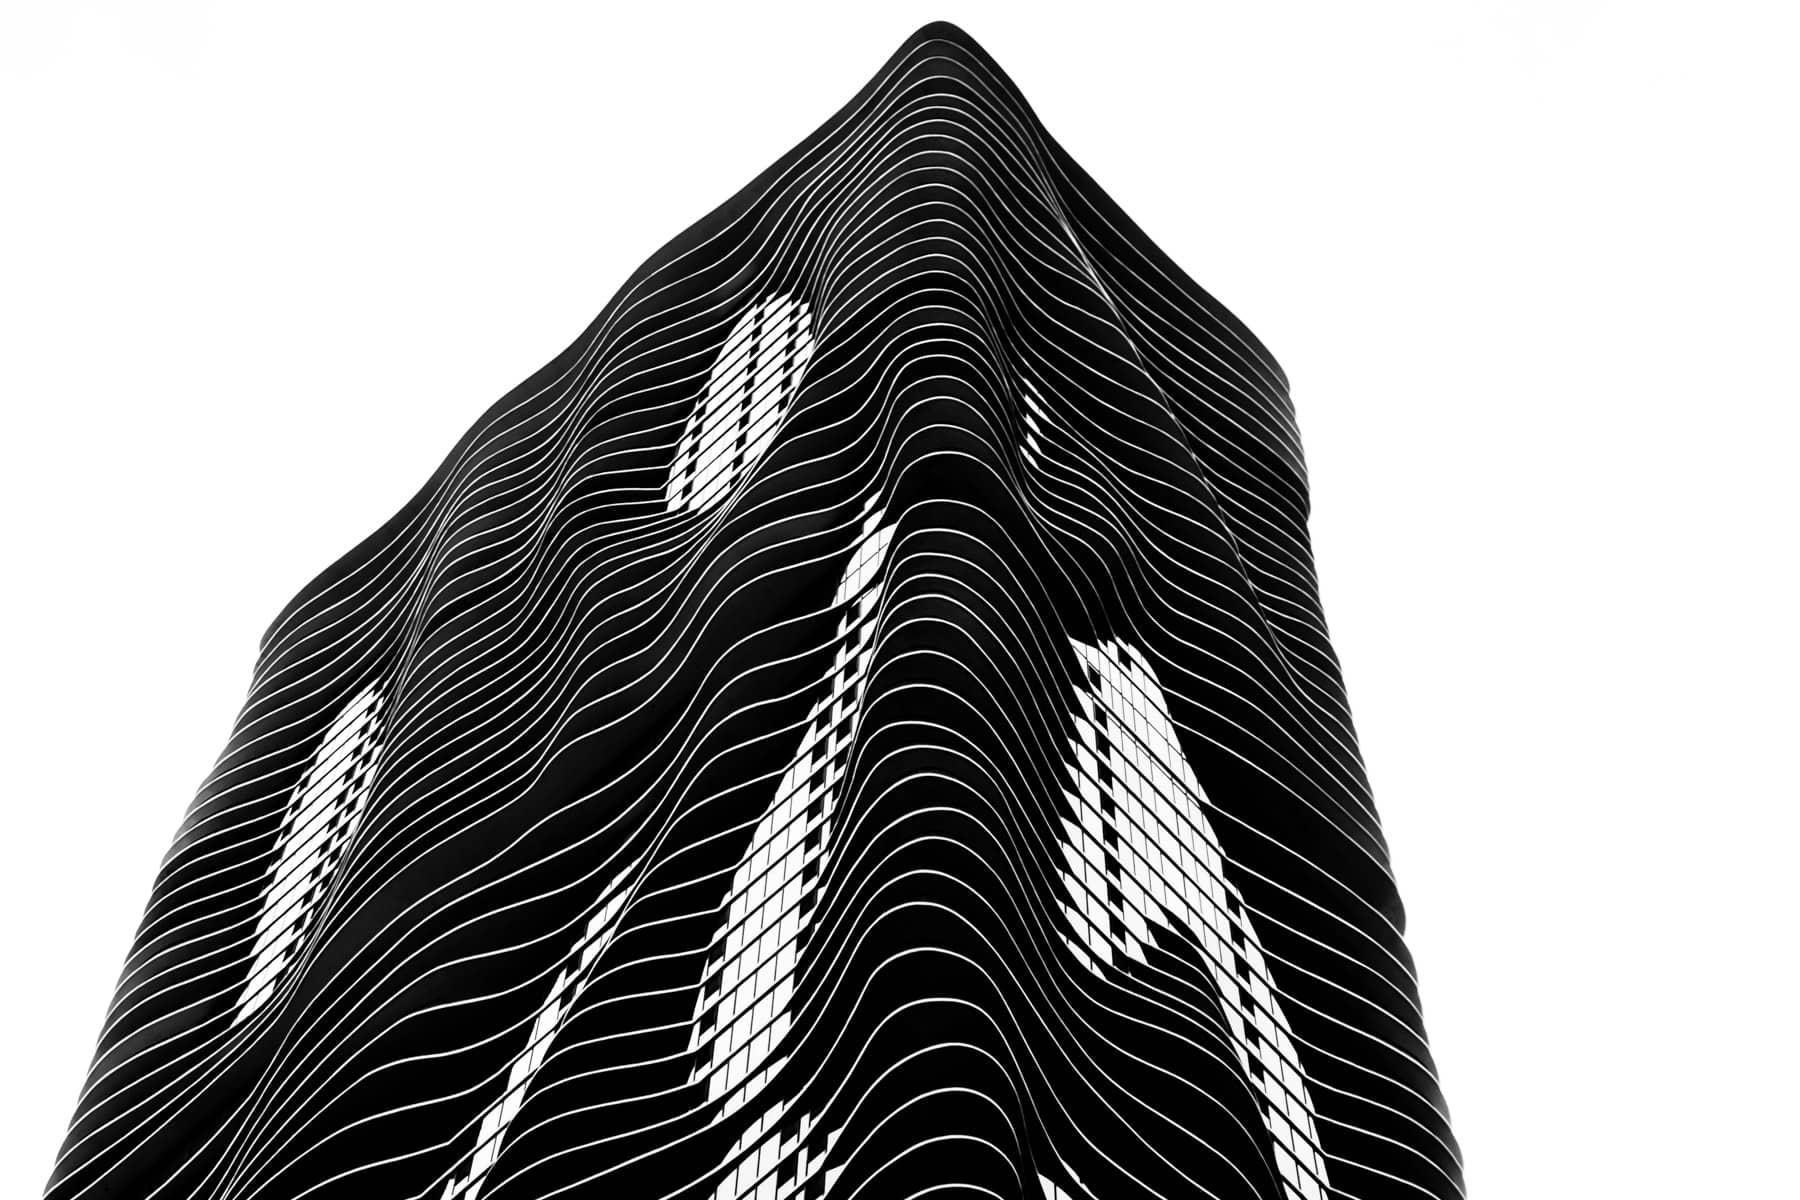 A minimalist architectural study of the undulating, irregular exterior of Chicago's 84-story-tall Aqua skyscraper.